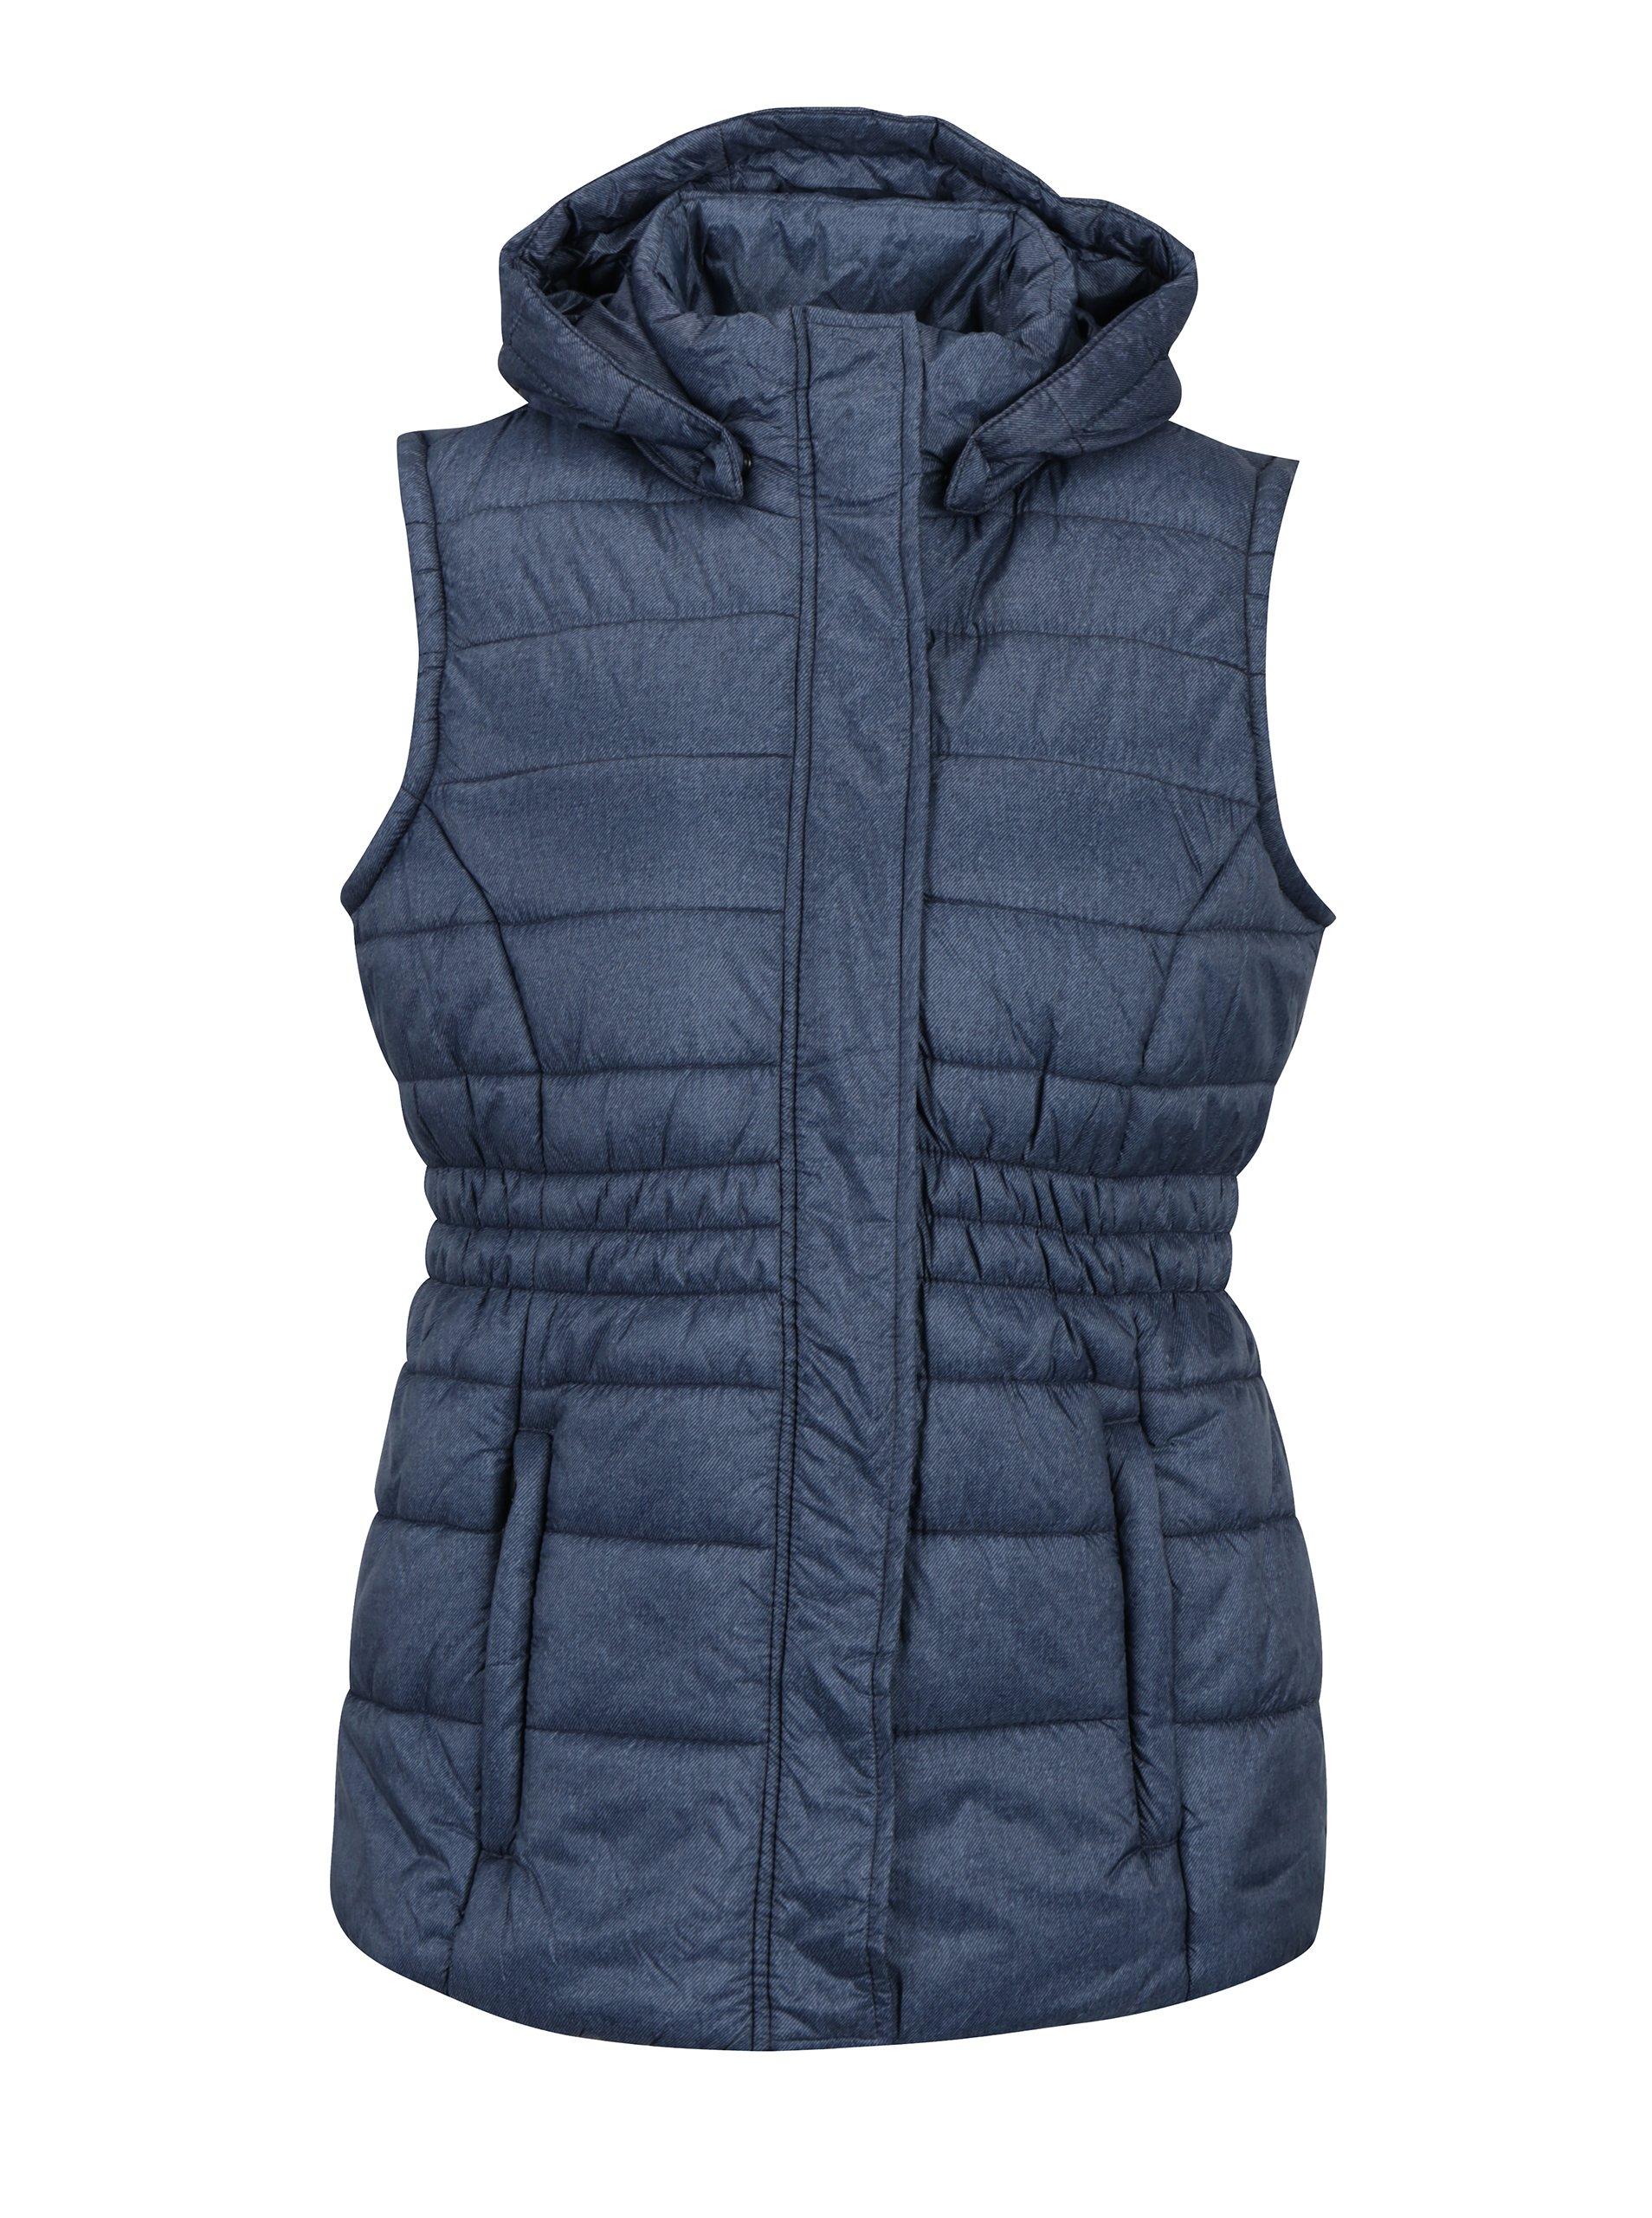 Modrá dámska vodoodpudivá prešívaná vesta LOAP Tanya  fff0ee19442